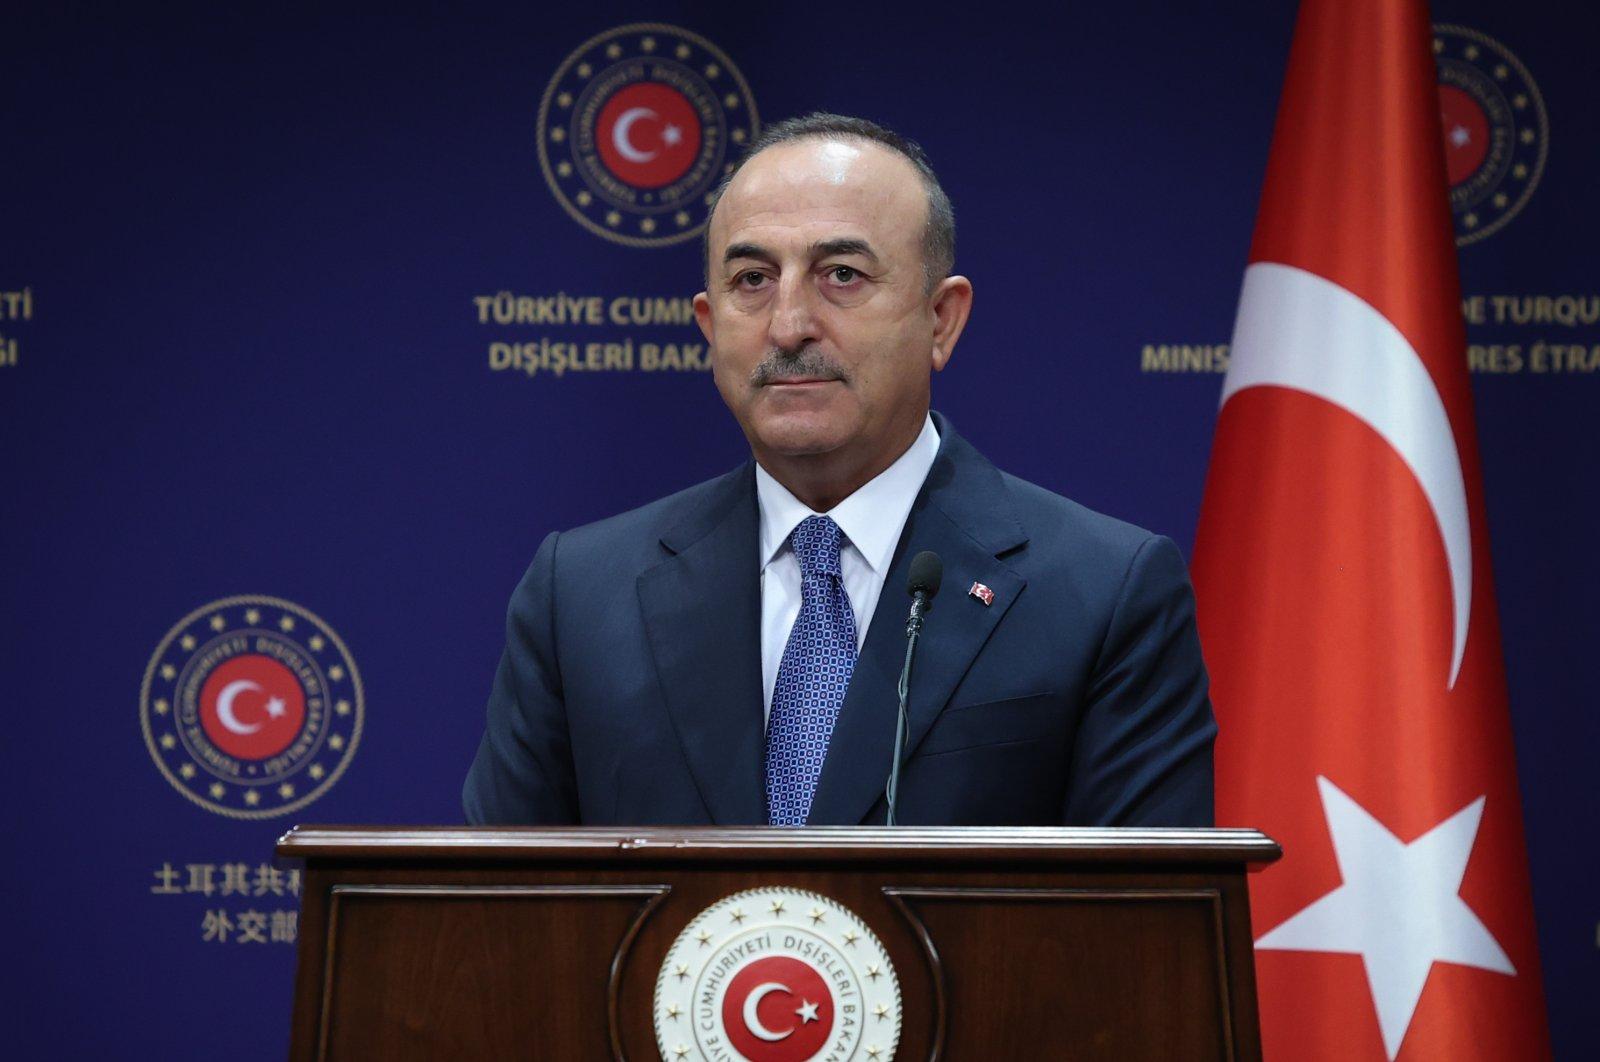 Foreign Minister Mevlüt Çavuşoğlu attends a joint press conference, in Ankara, Turkey, Sept. 2, 2021 (AA Photo)